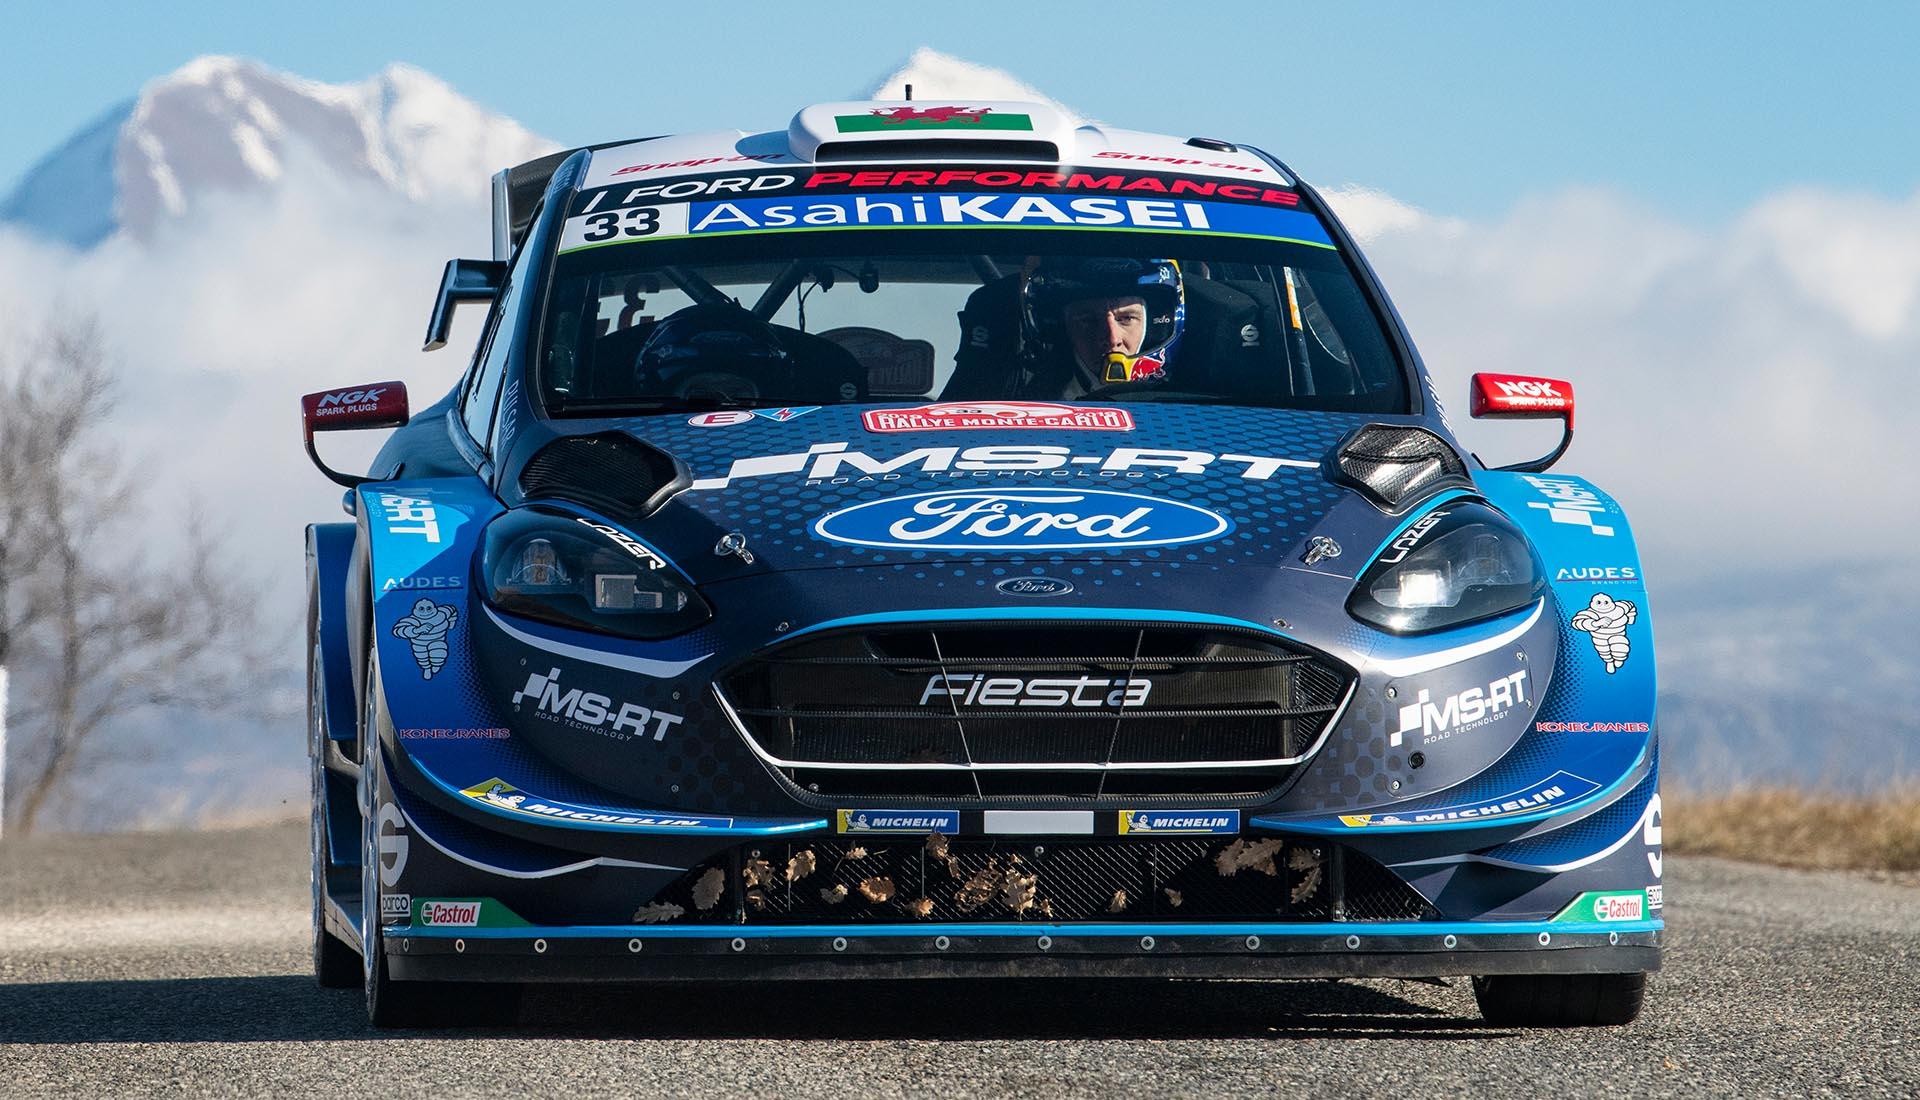 elfyn-evans-2019-rallye-monte-carlo-00043.jpg